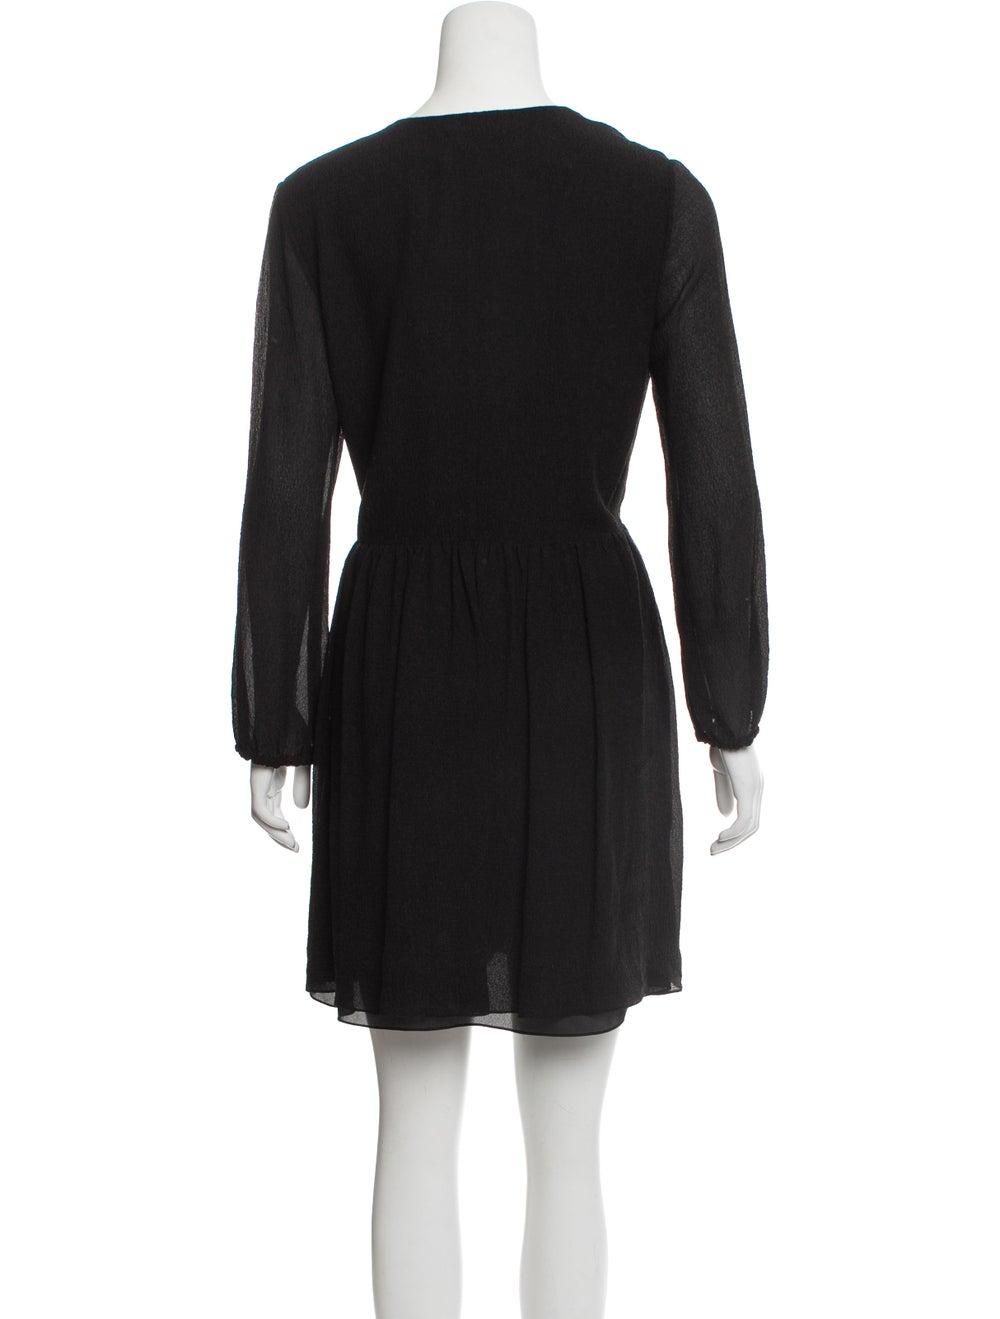 Chloé Silk Seersucker Dress w/ Tags Black - image 3